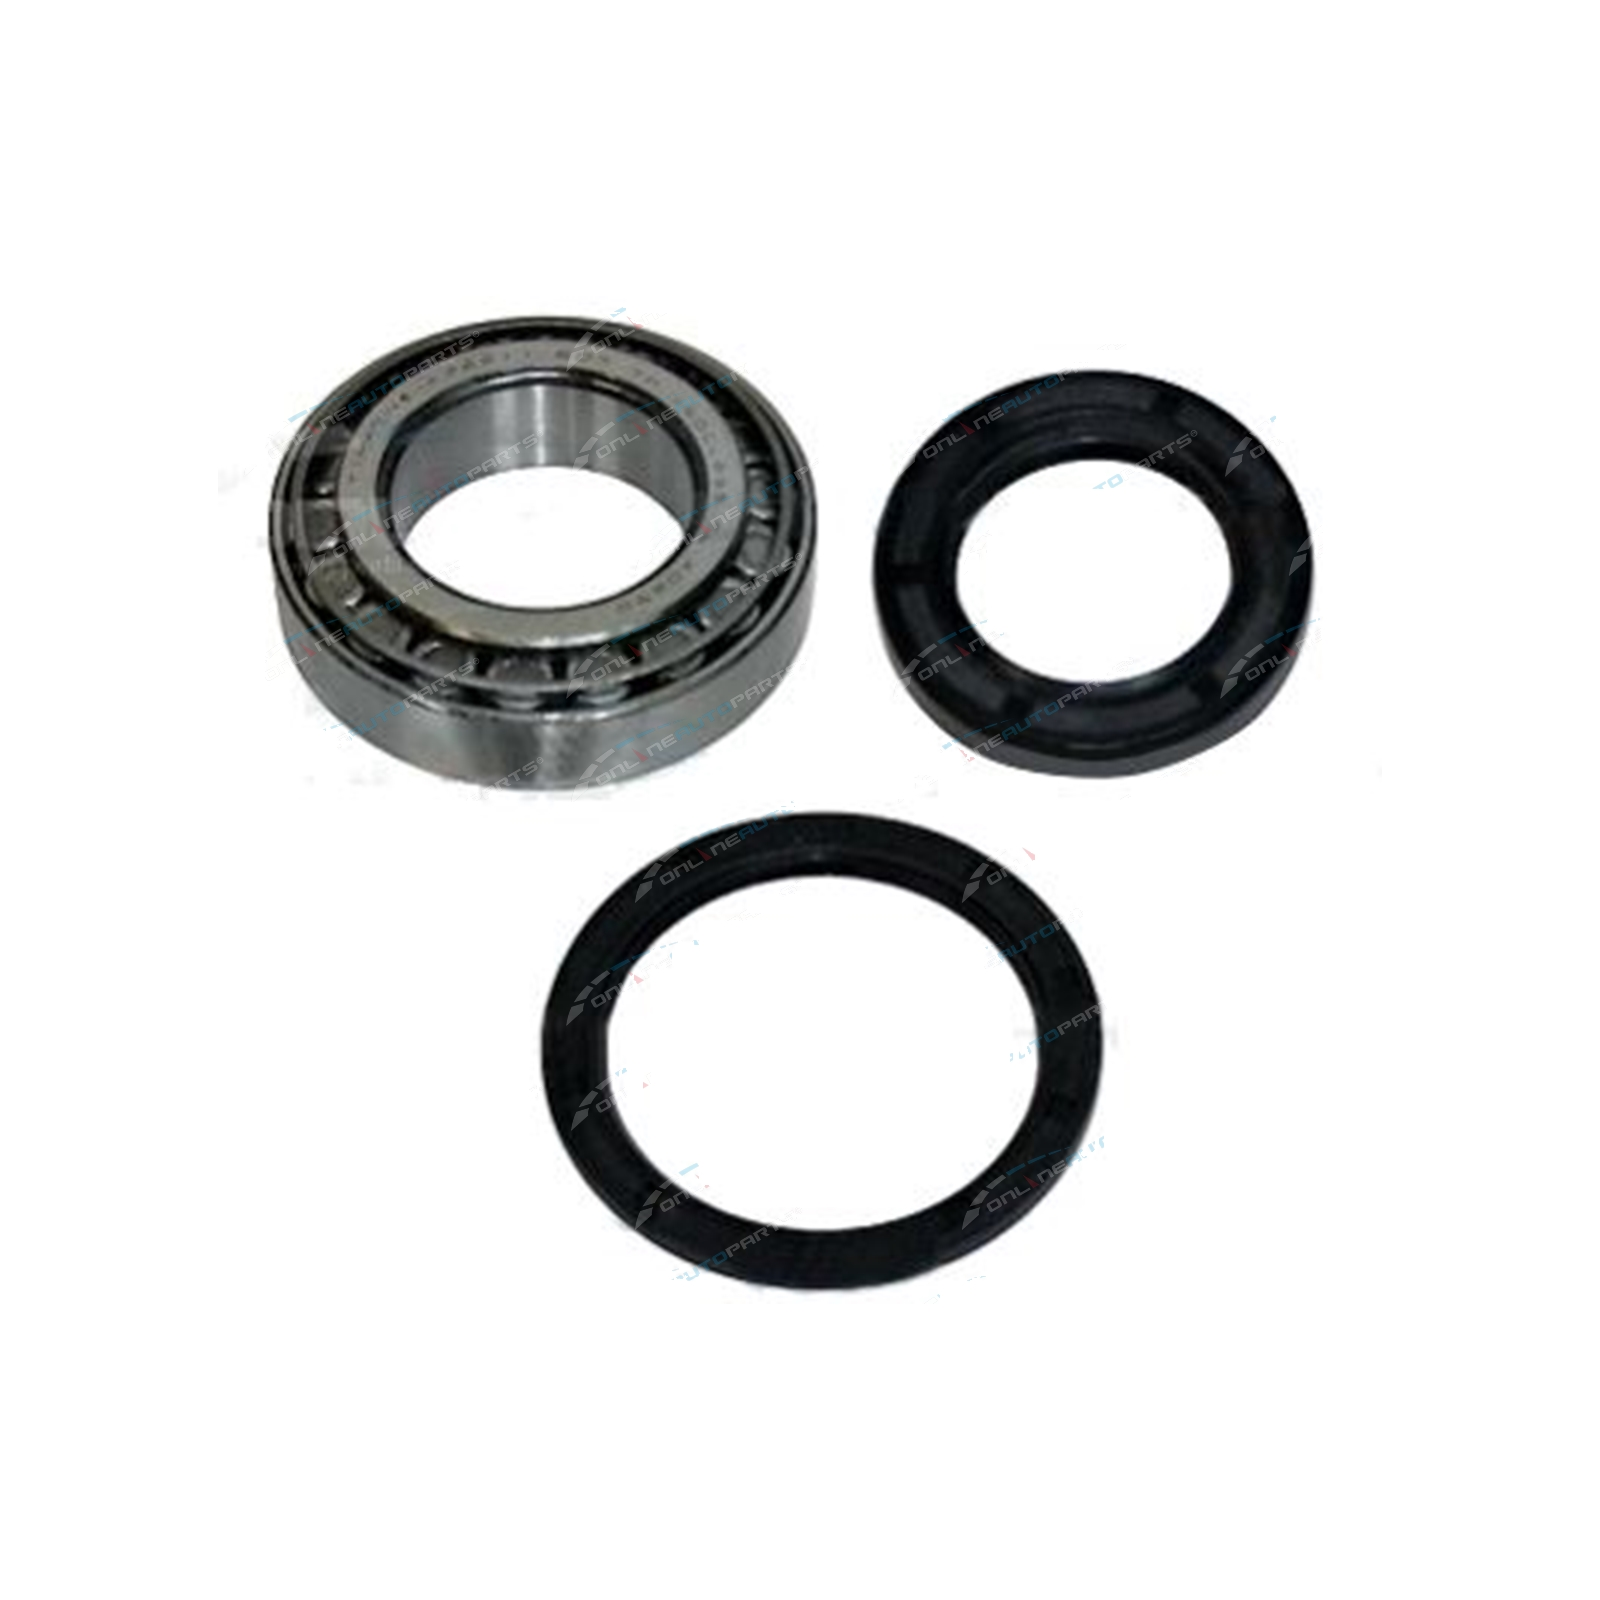 Wheel Bearing (Rear LH or Rear RH) OEM Replacement